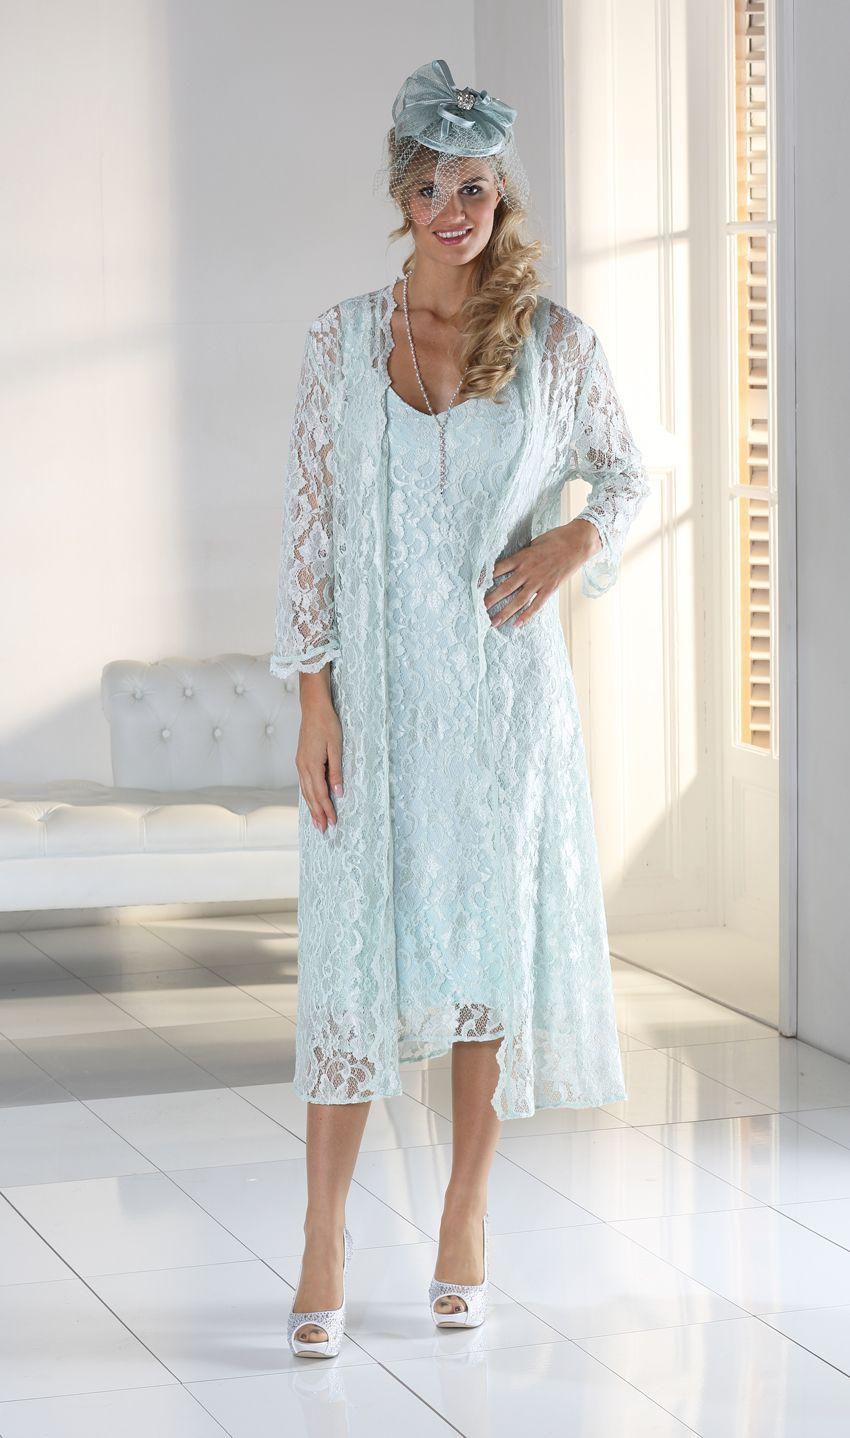 p>Ann Balon Lace Pamela Three Piece In Madre Perla<p> <p>A fabulous ...